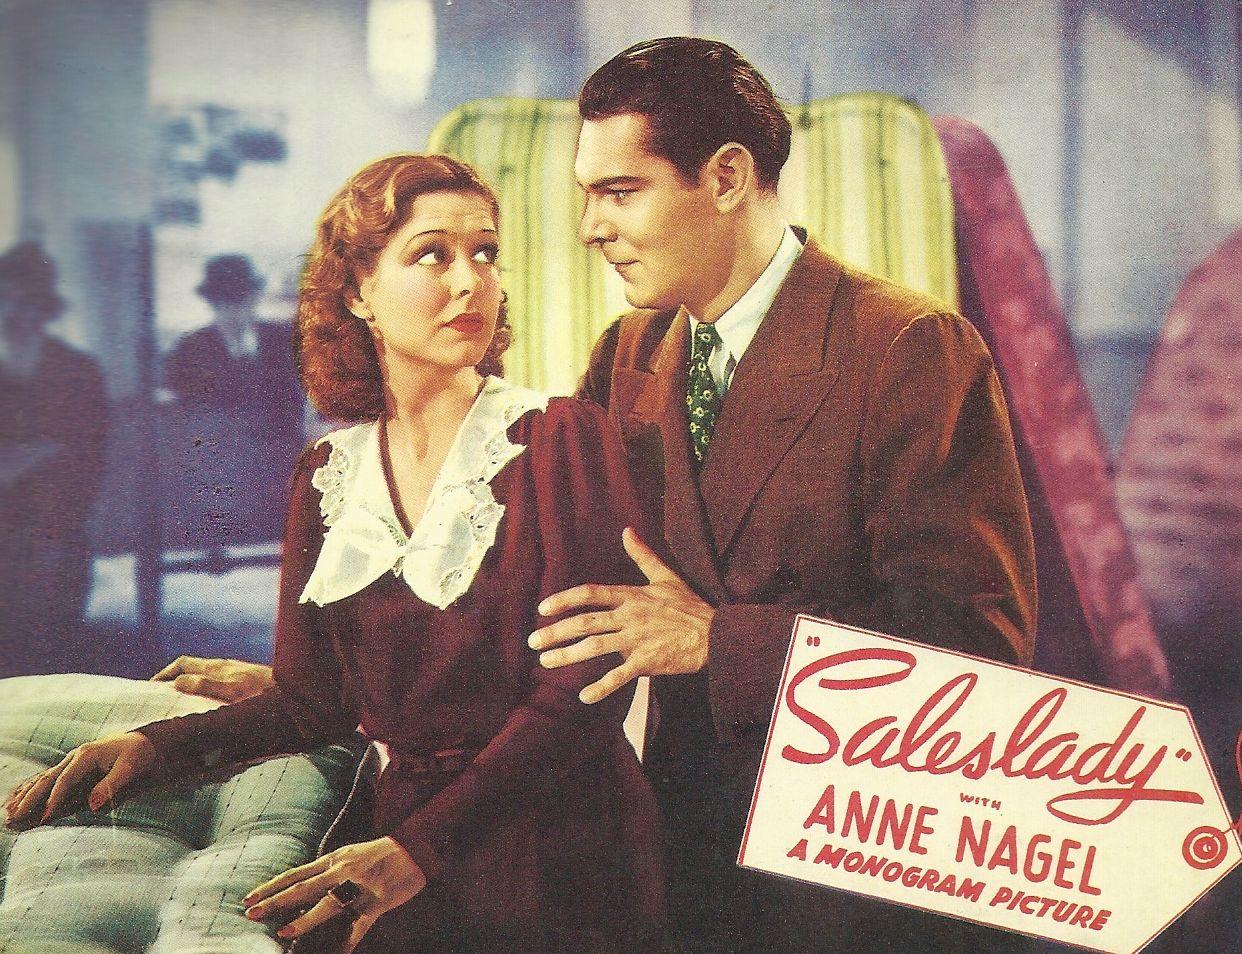 Weldon Heyburn and Anne Nagel in Saleslady (1938)